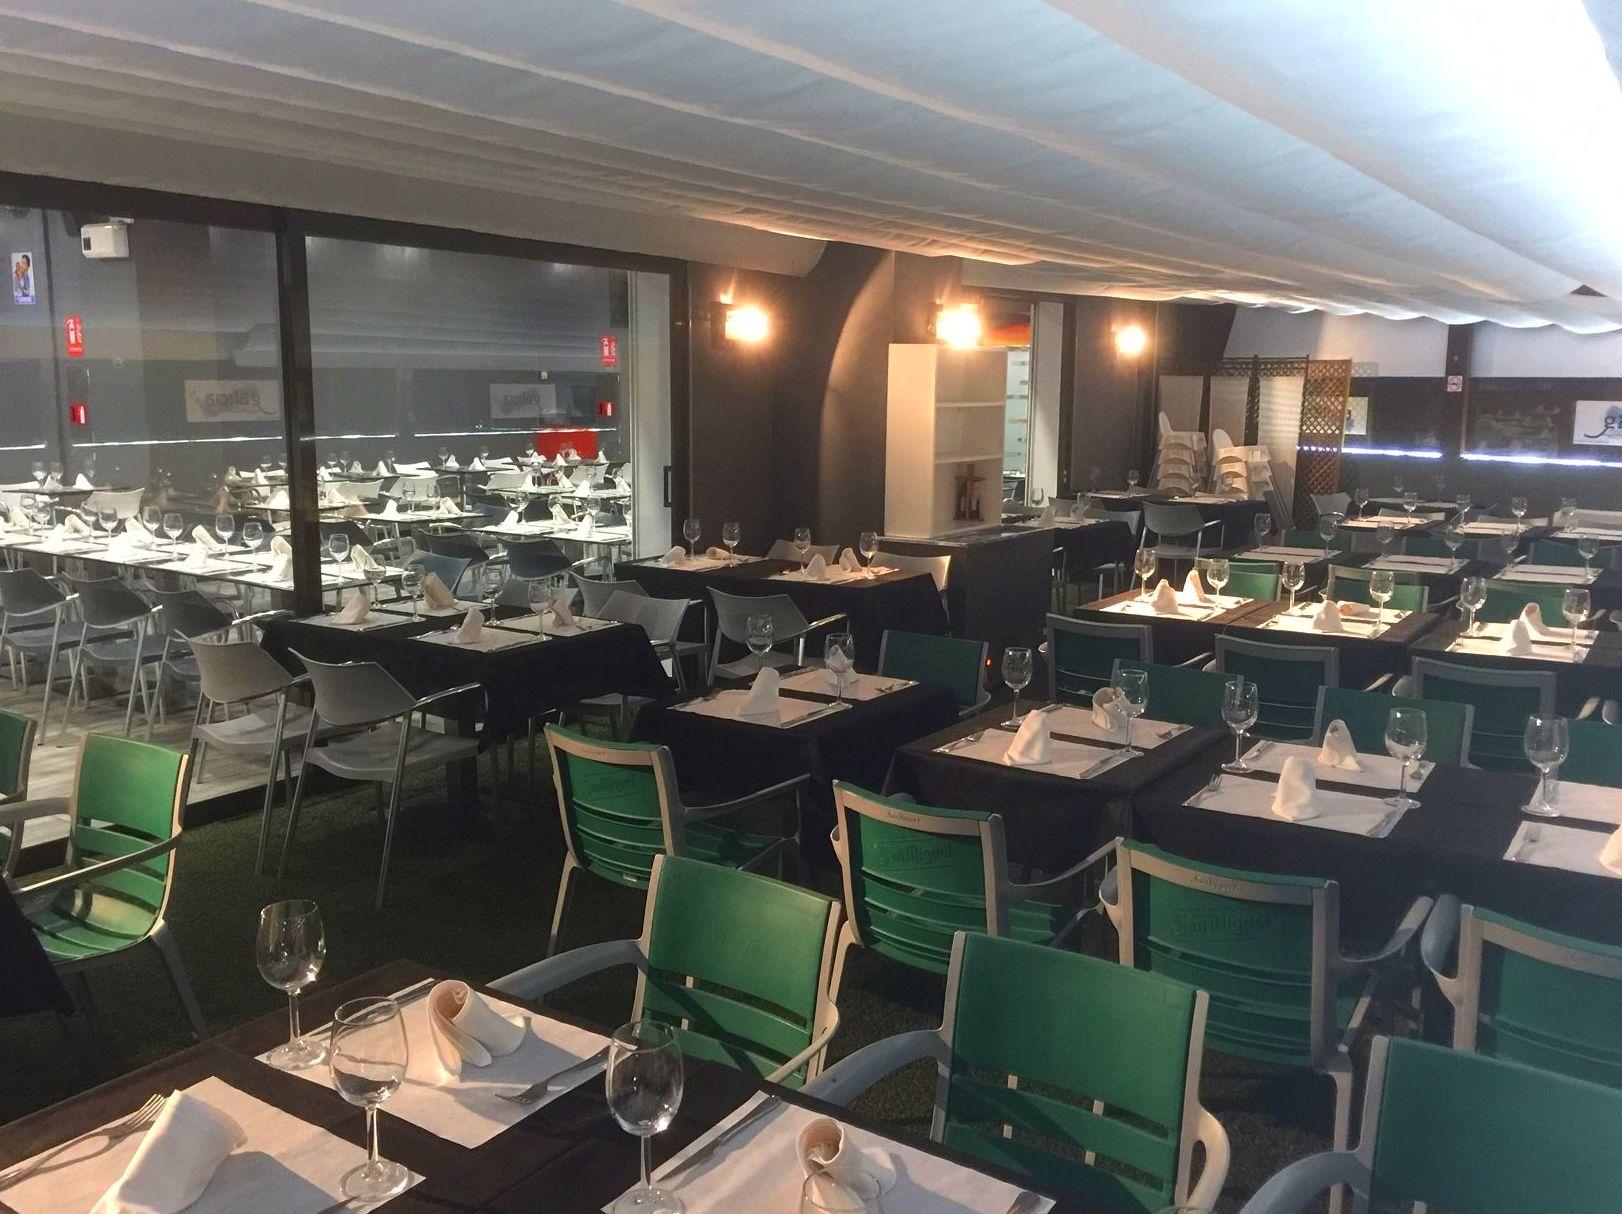 Picture 2 of Restaurante in Madrid | Restaurante Galicia Las Tablas